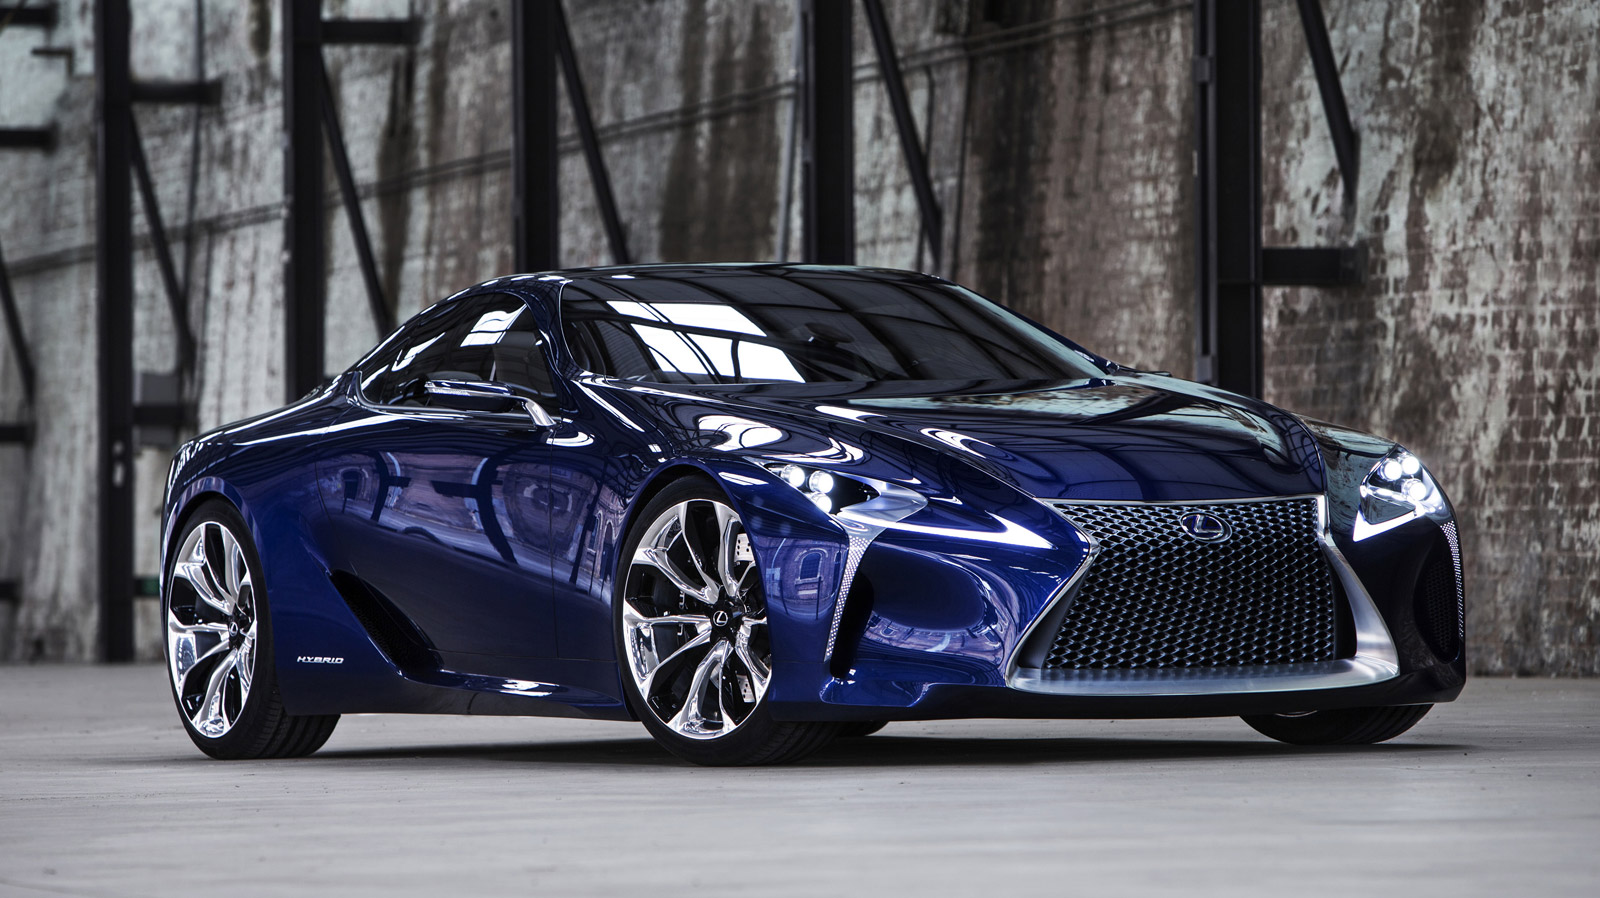 laferrari nürburgring video, lexus lf-lc production, sema chevy ss